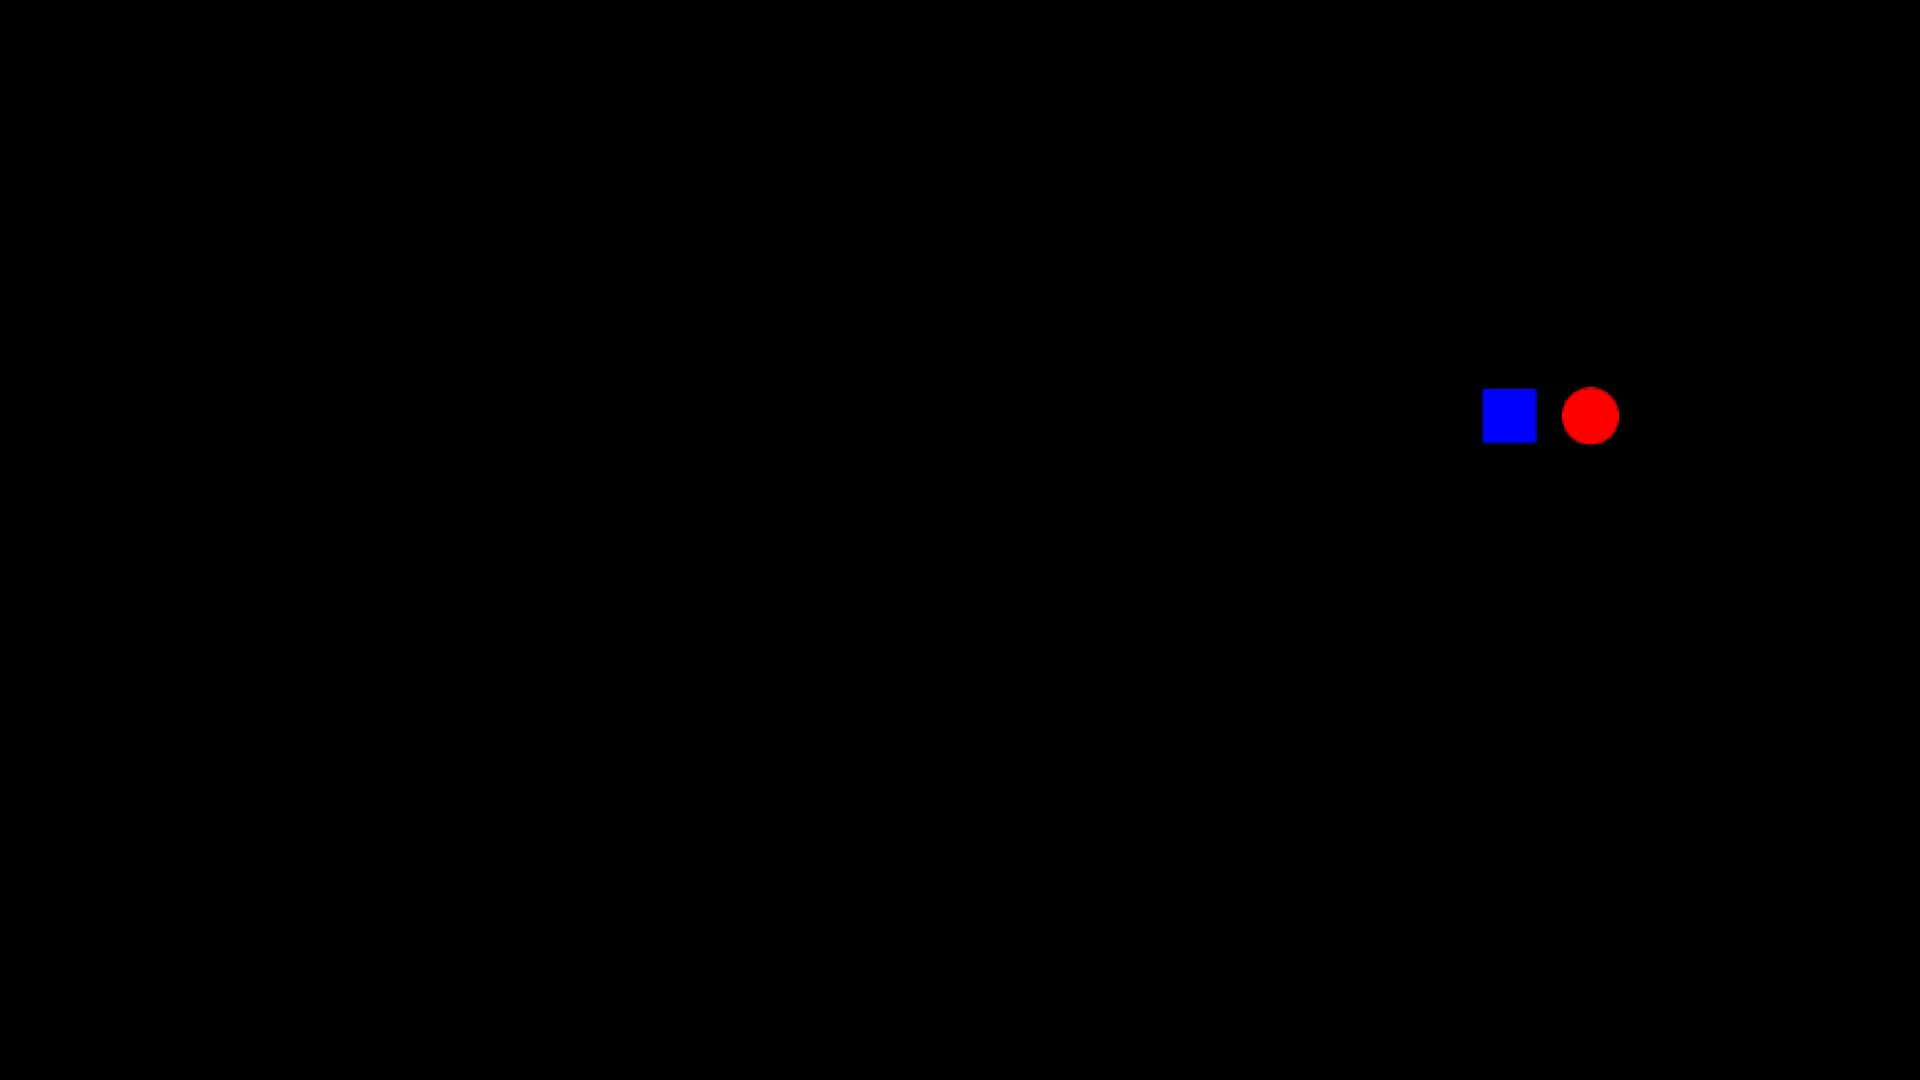 dmexco 2018 Logo Messenger Veranstaltung Workshop Messengerpeople